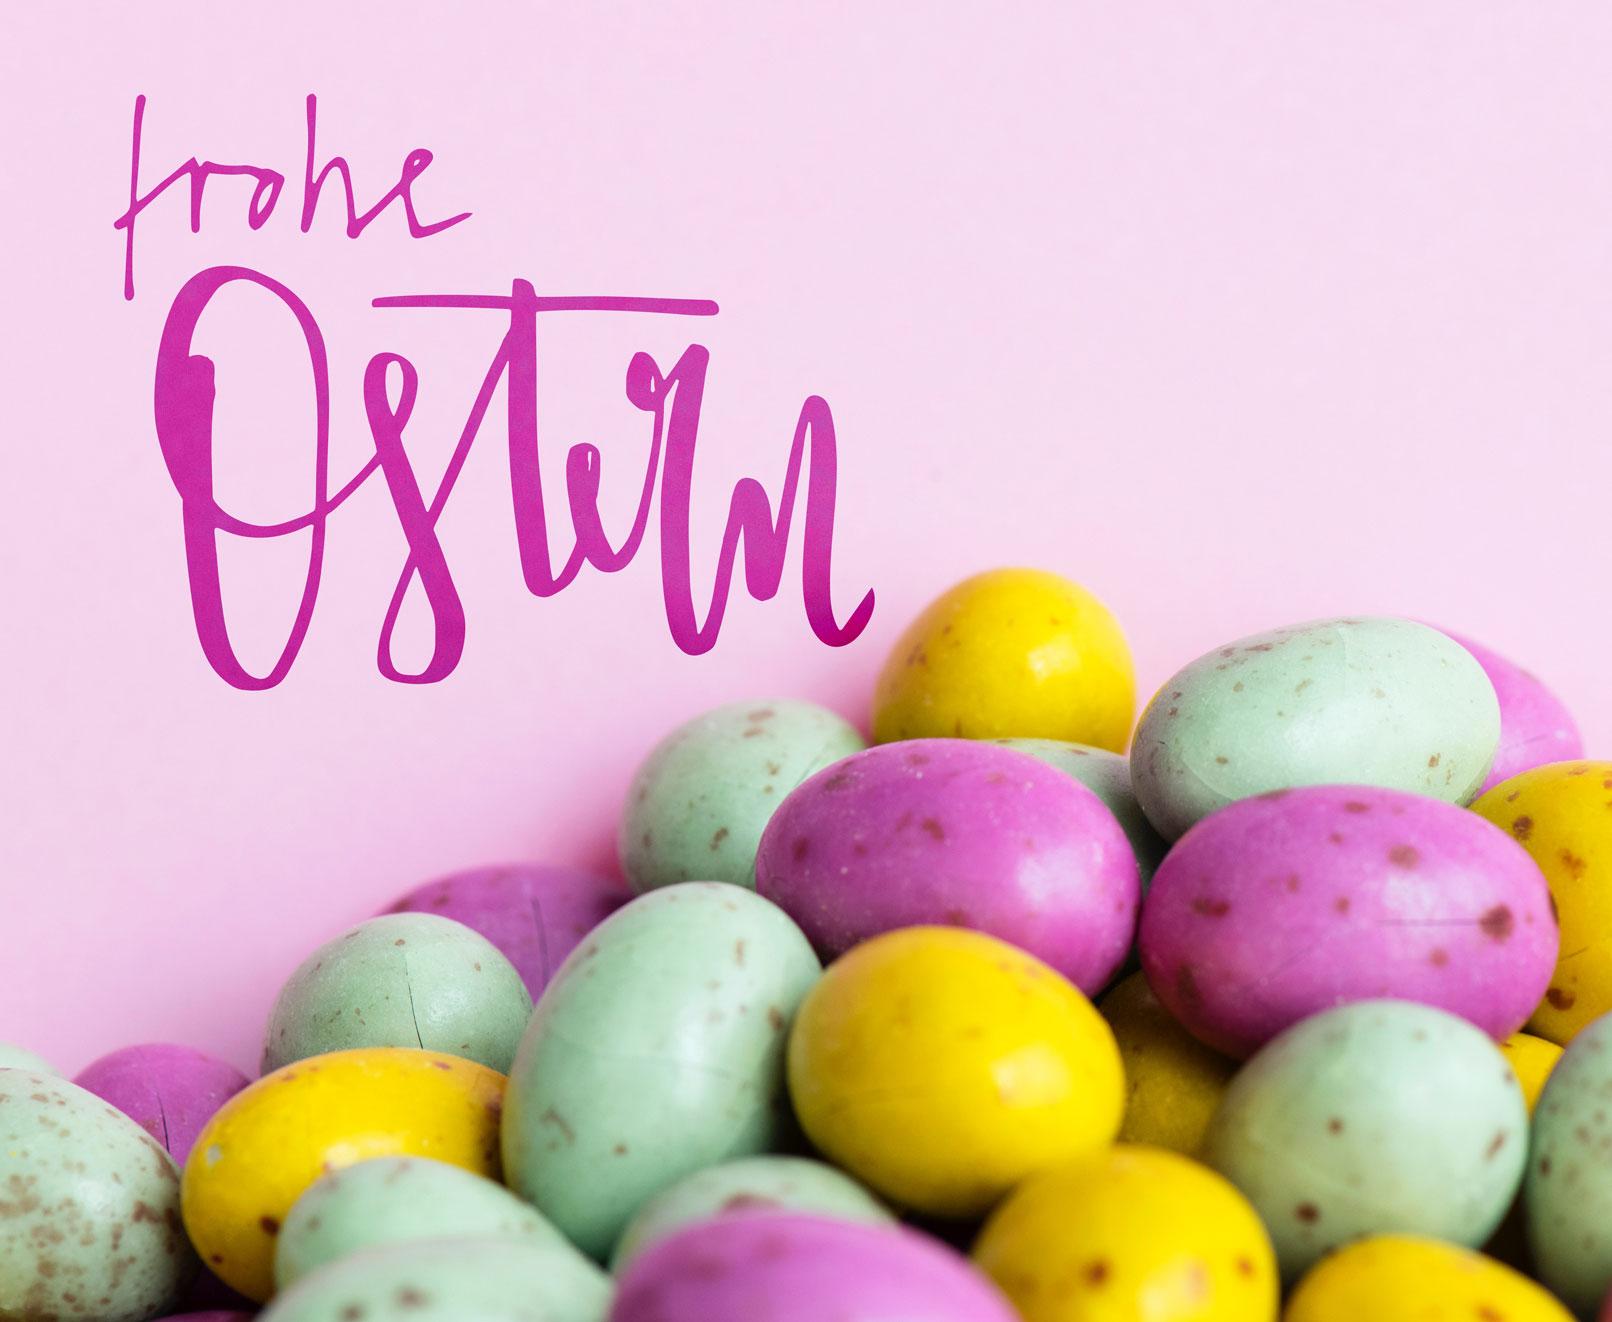 Ostereier, Handlettering Ostern mit Ostergruß